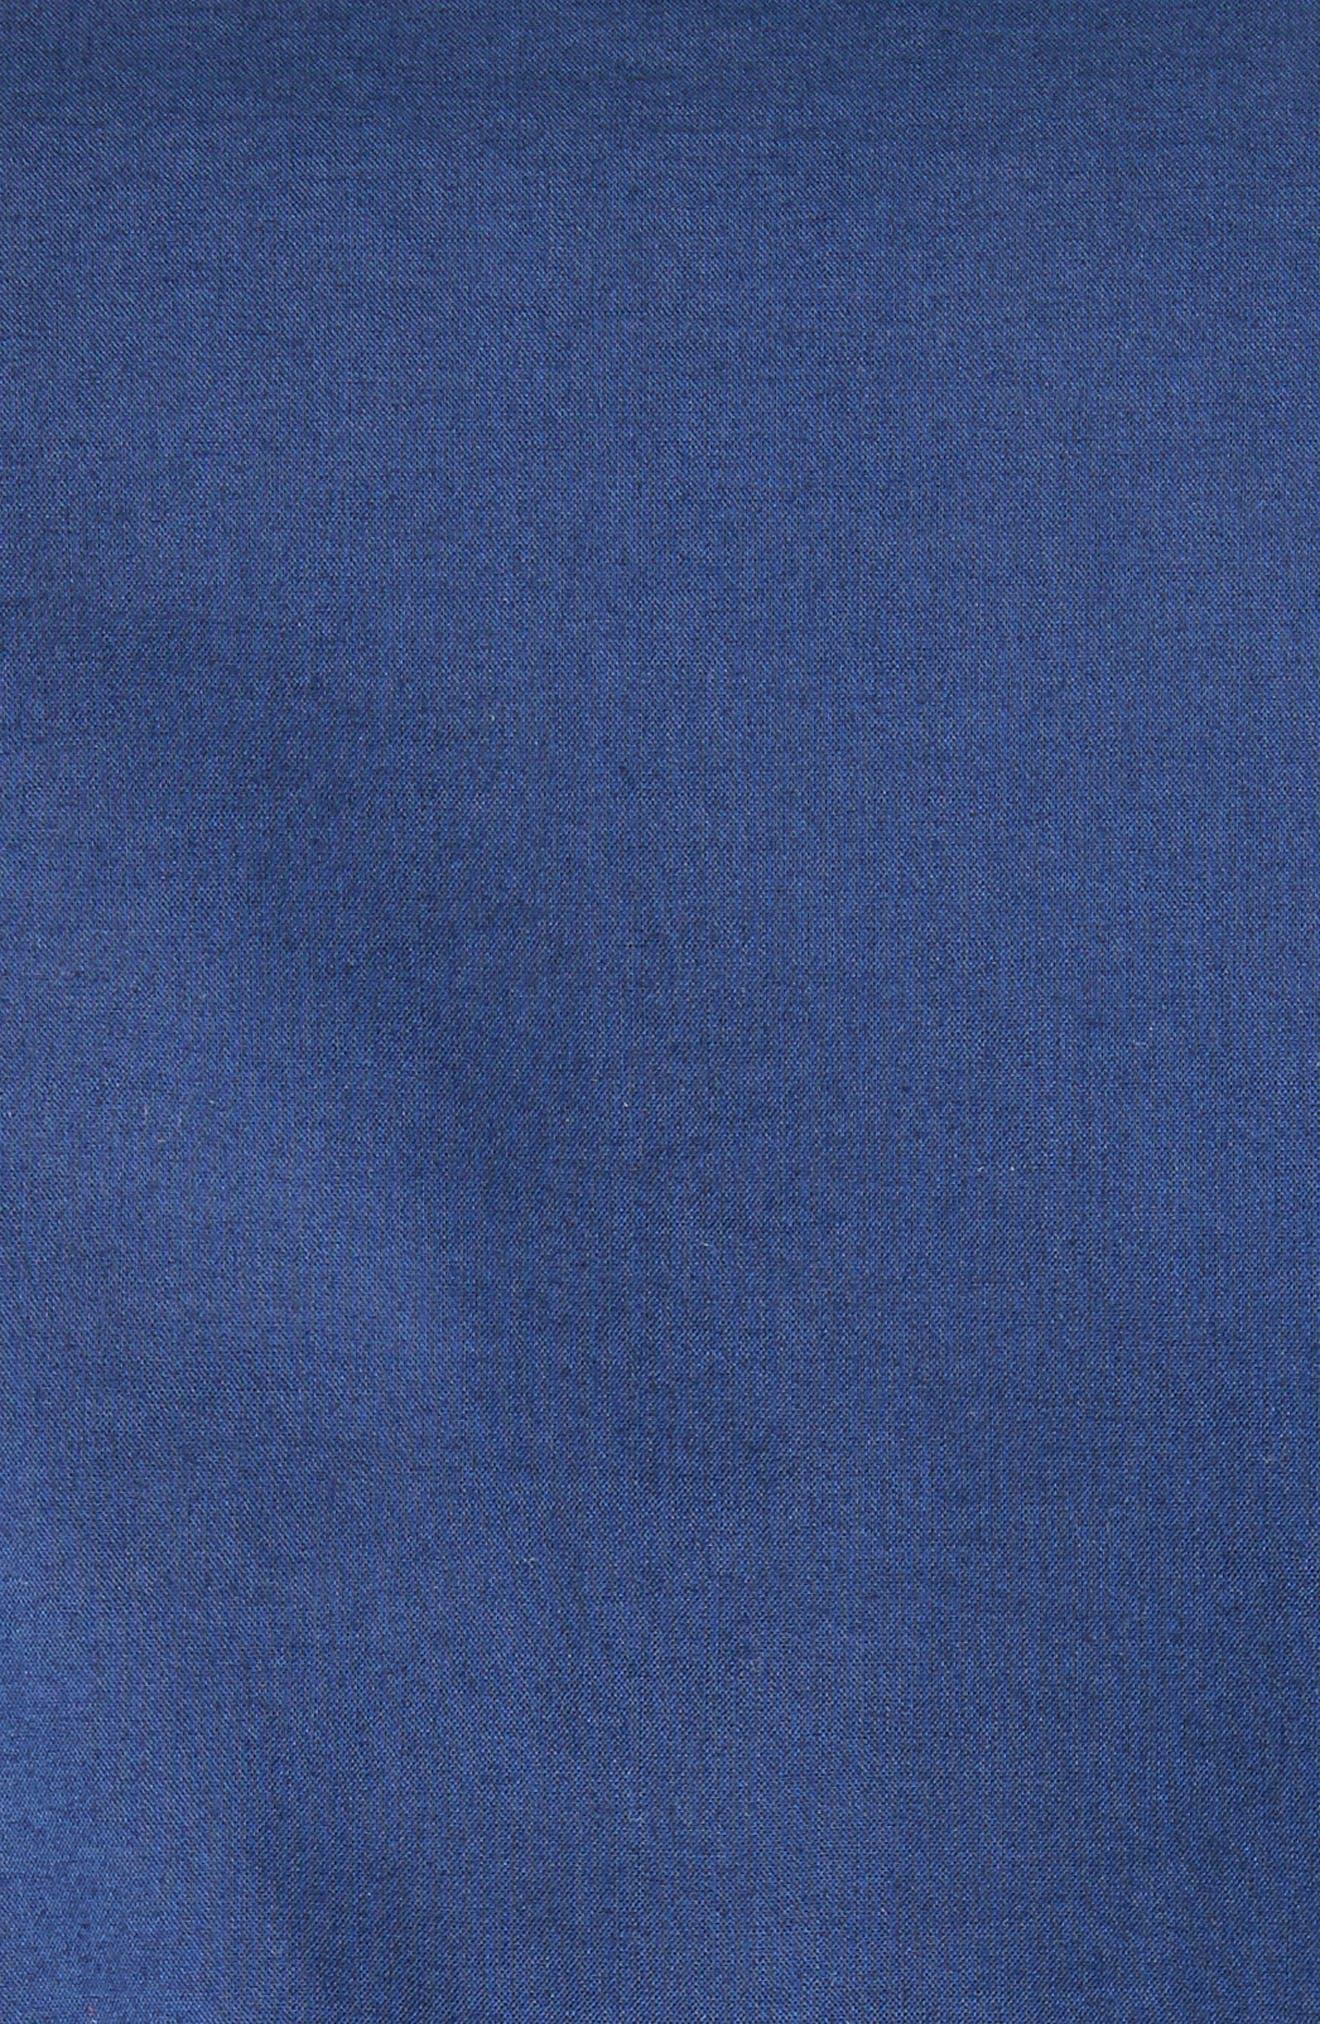 Embellished Tory Tunic,                             Alternate thumbnail 5, color,                             458